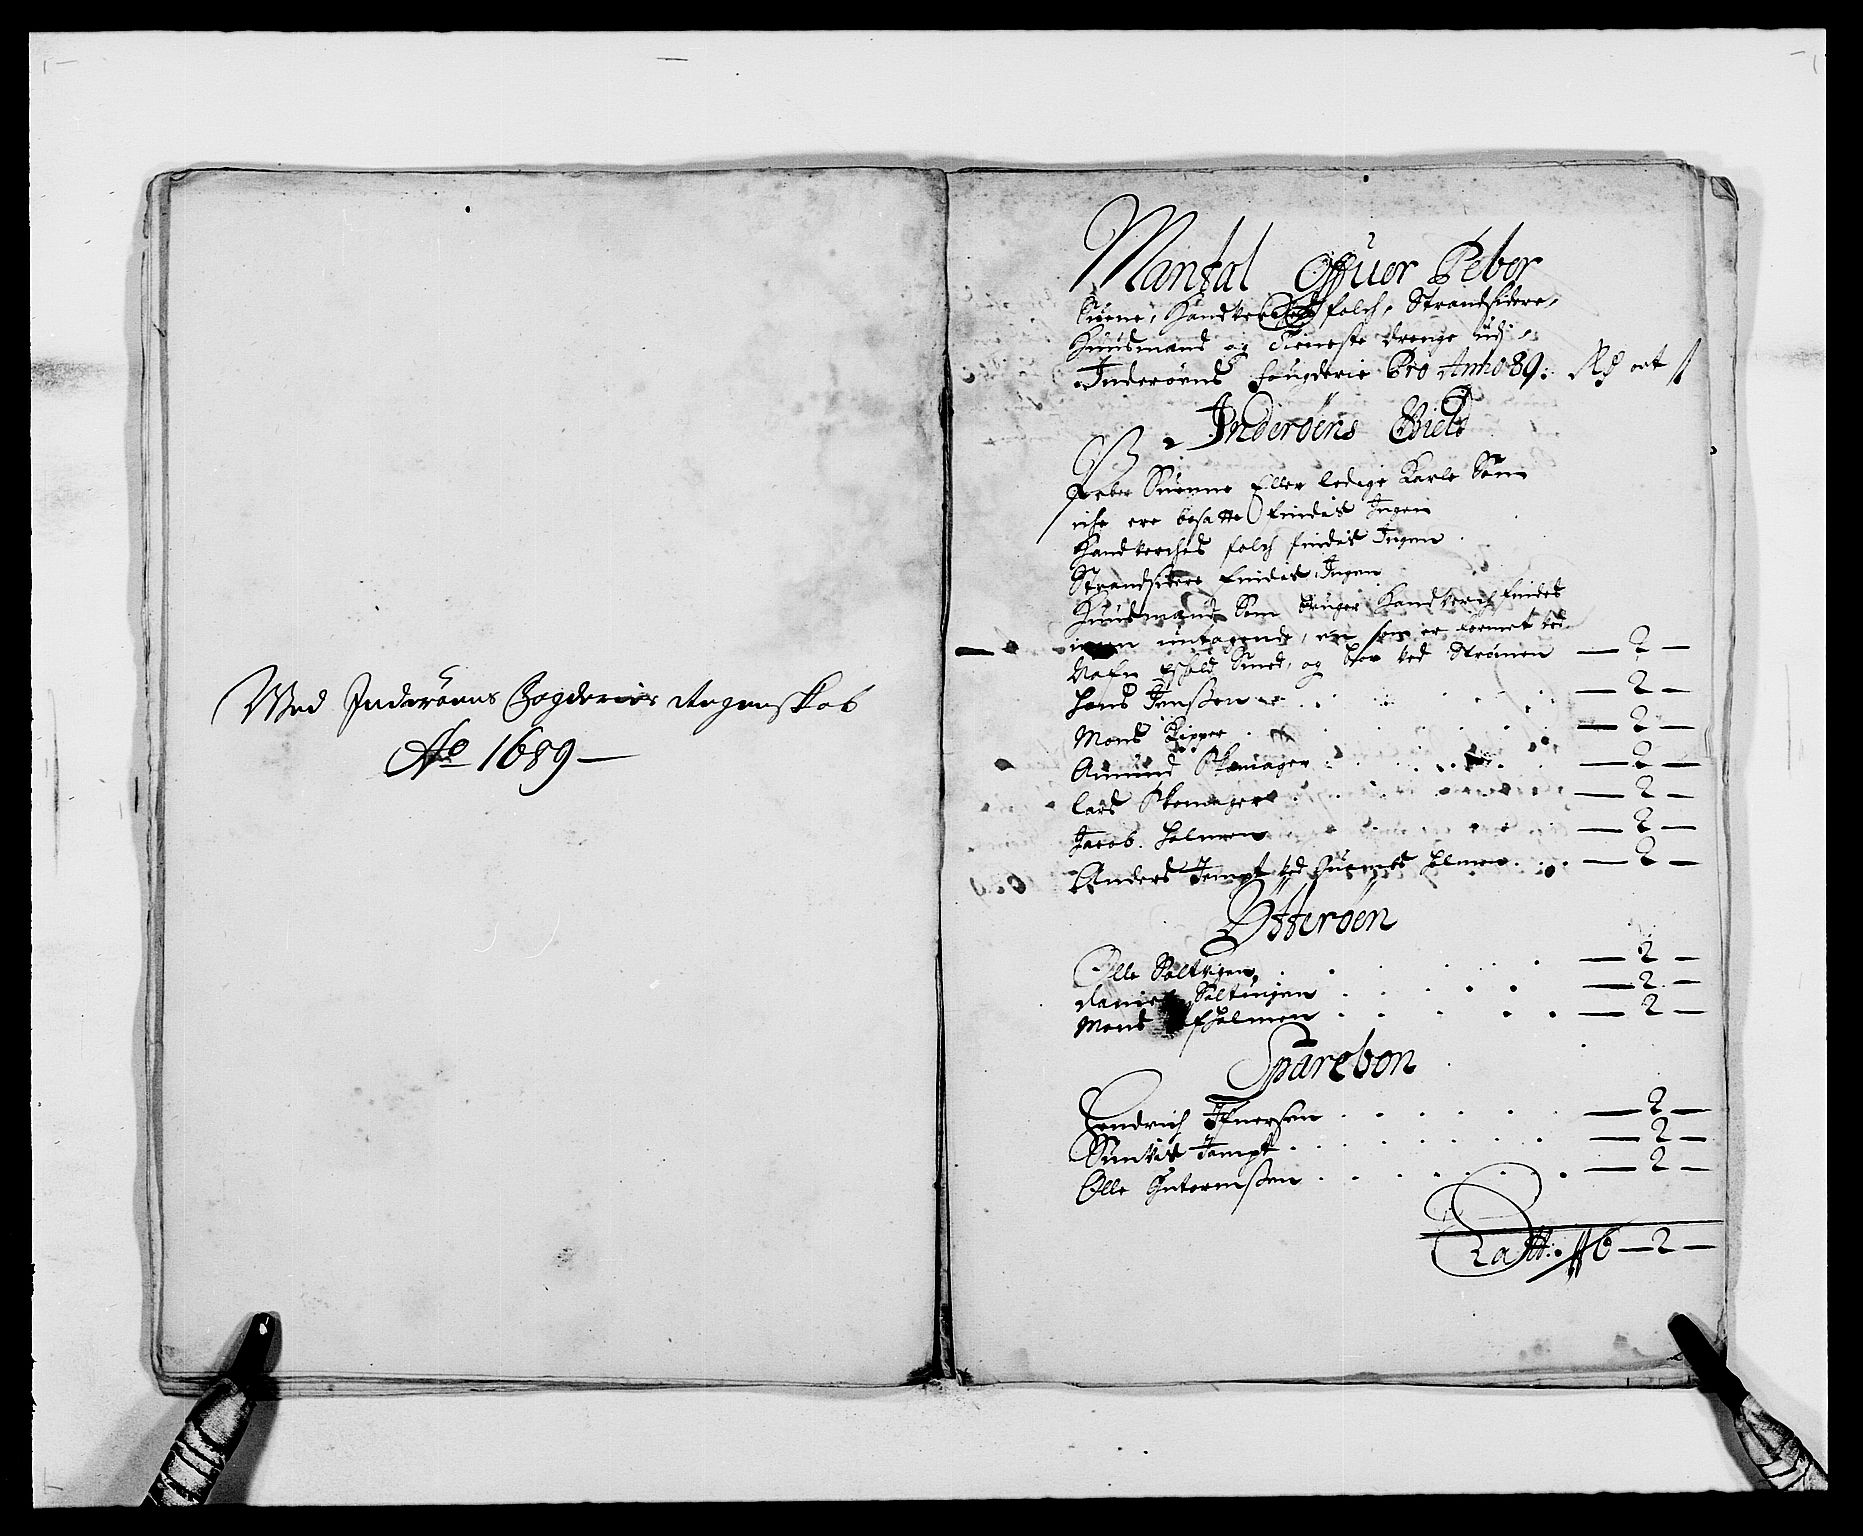 RA, Rentekammeret inntil 1814, Reviderte regnskaper, Fogderegnskap, R63/L4306: Fogderegnskap Inderøy, 1687-1689, s. 404